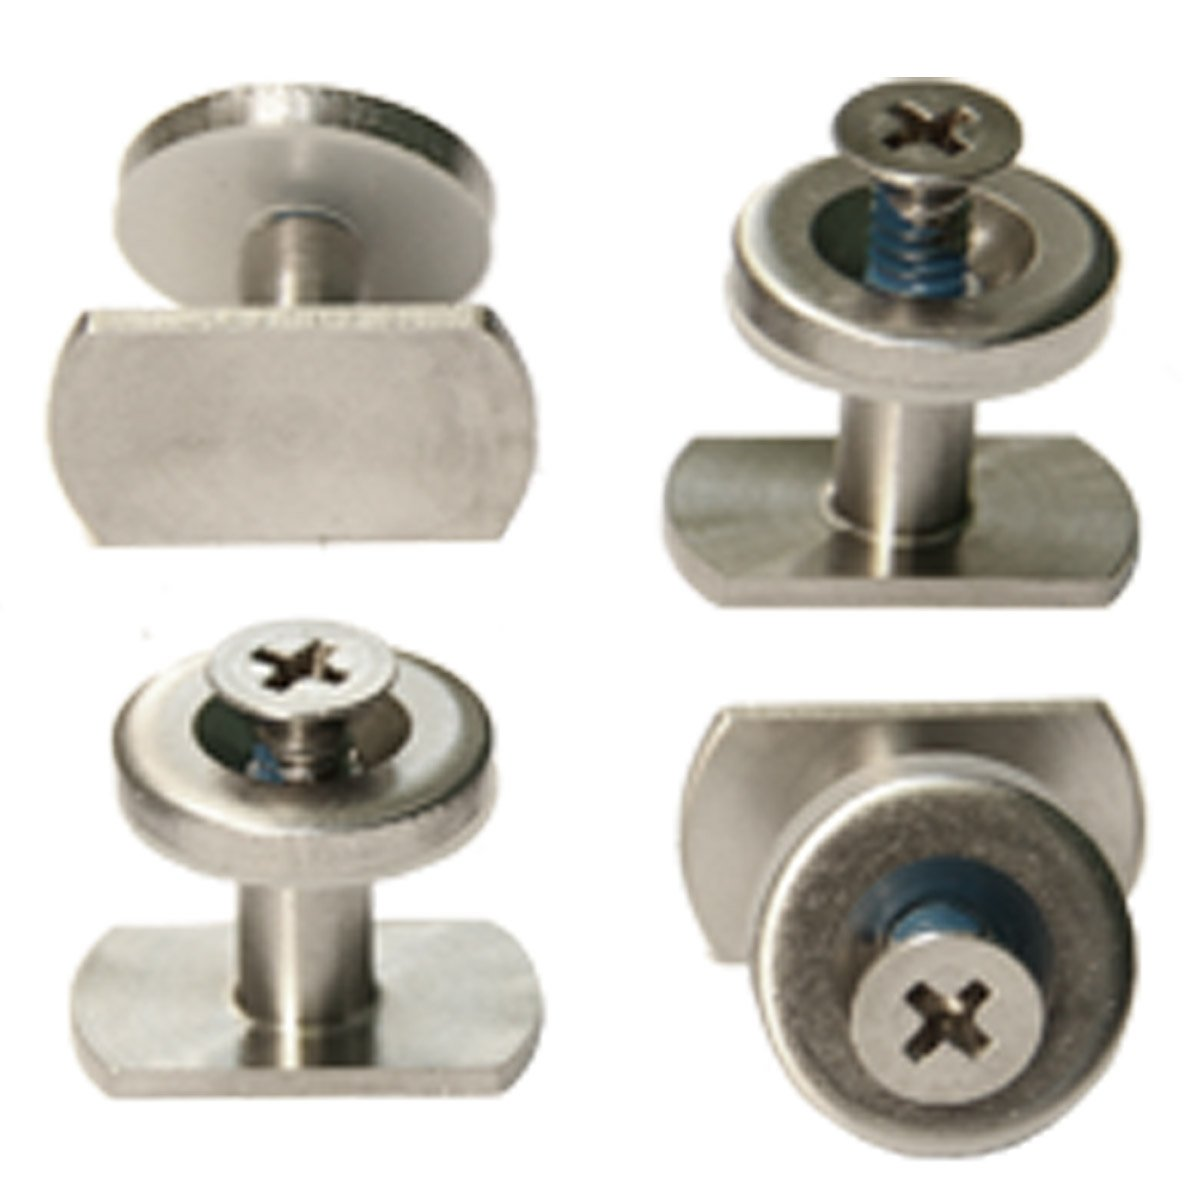 Slingshot Fastrack hardware kit